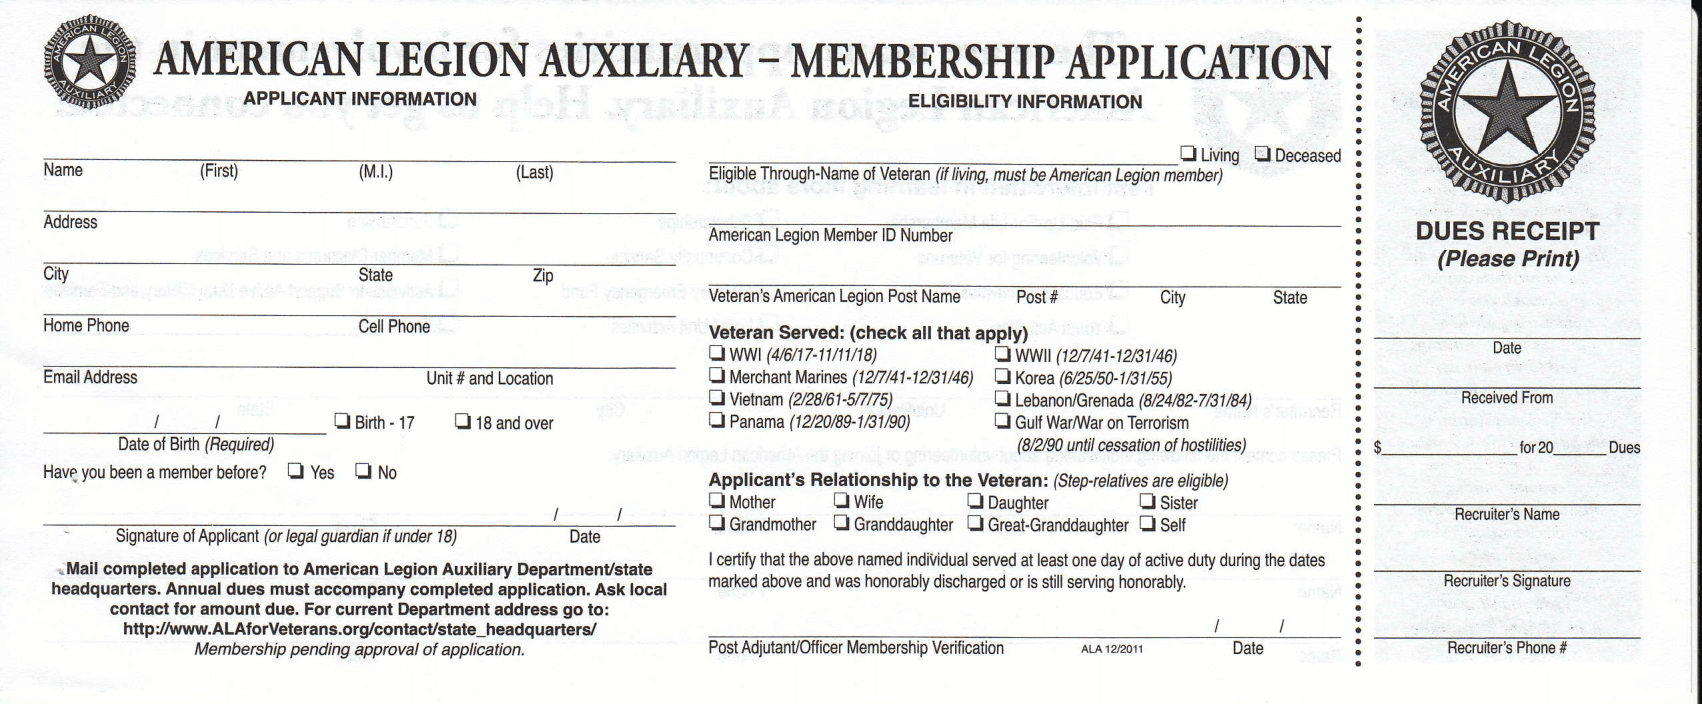 AUX Membership Form-1.png